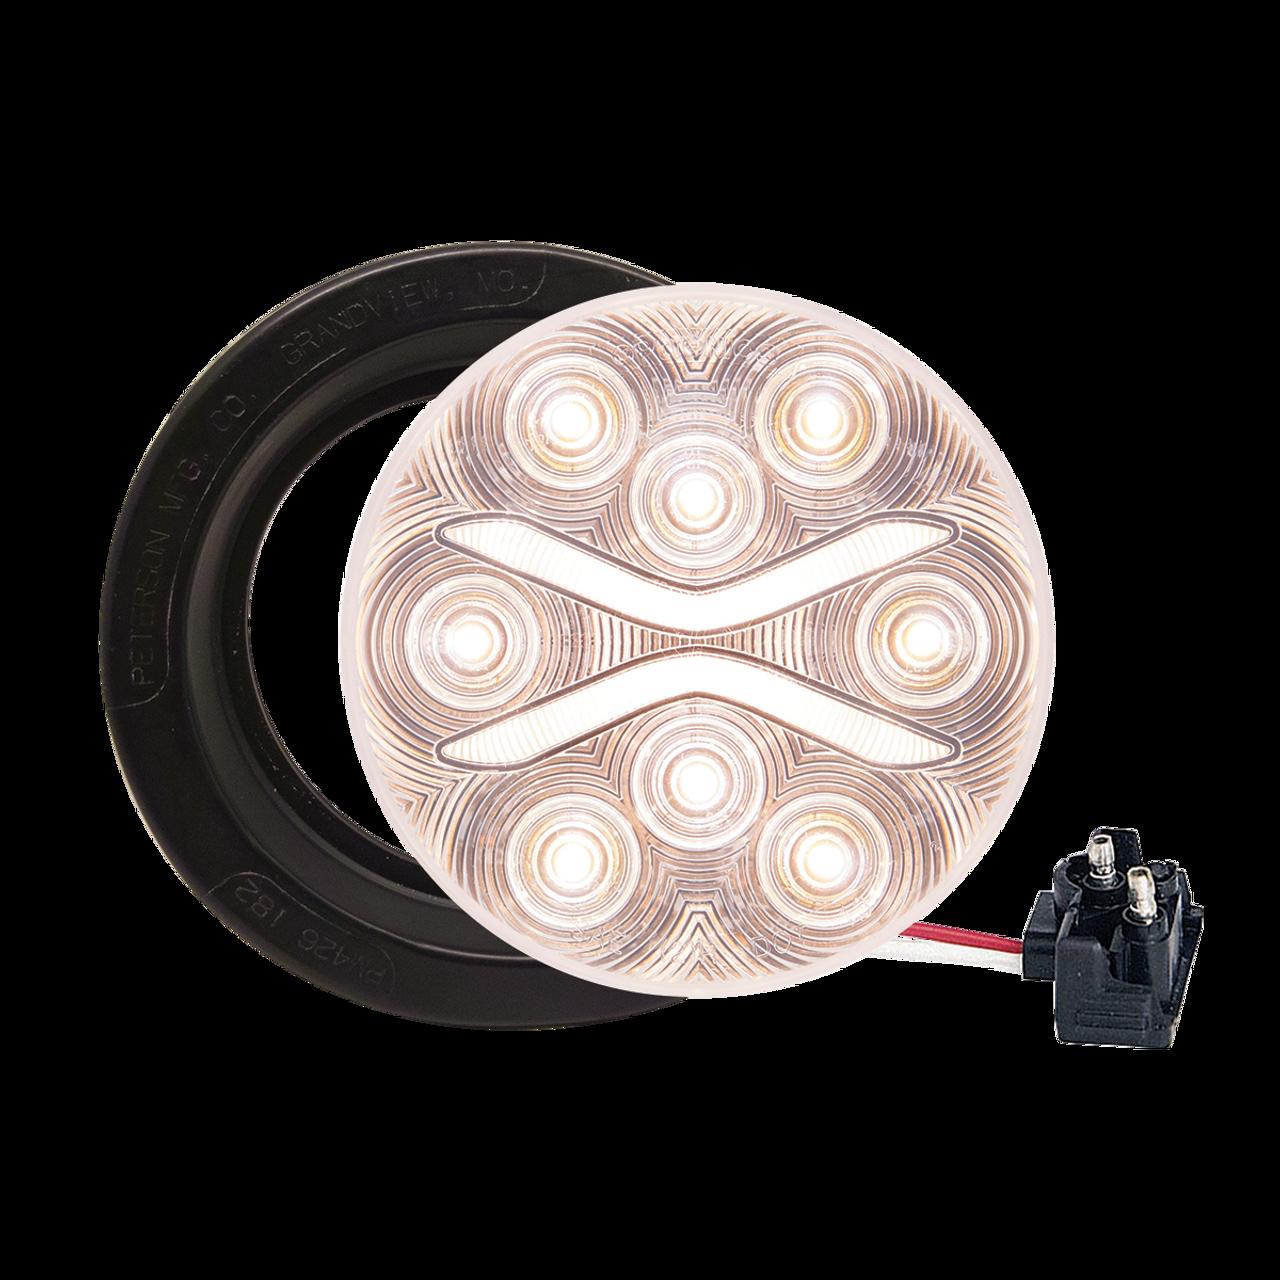 BUL603KCBP --- Round Sealed LED Clear Back-Up Light Kit